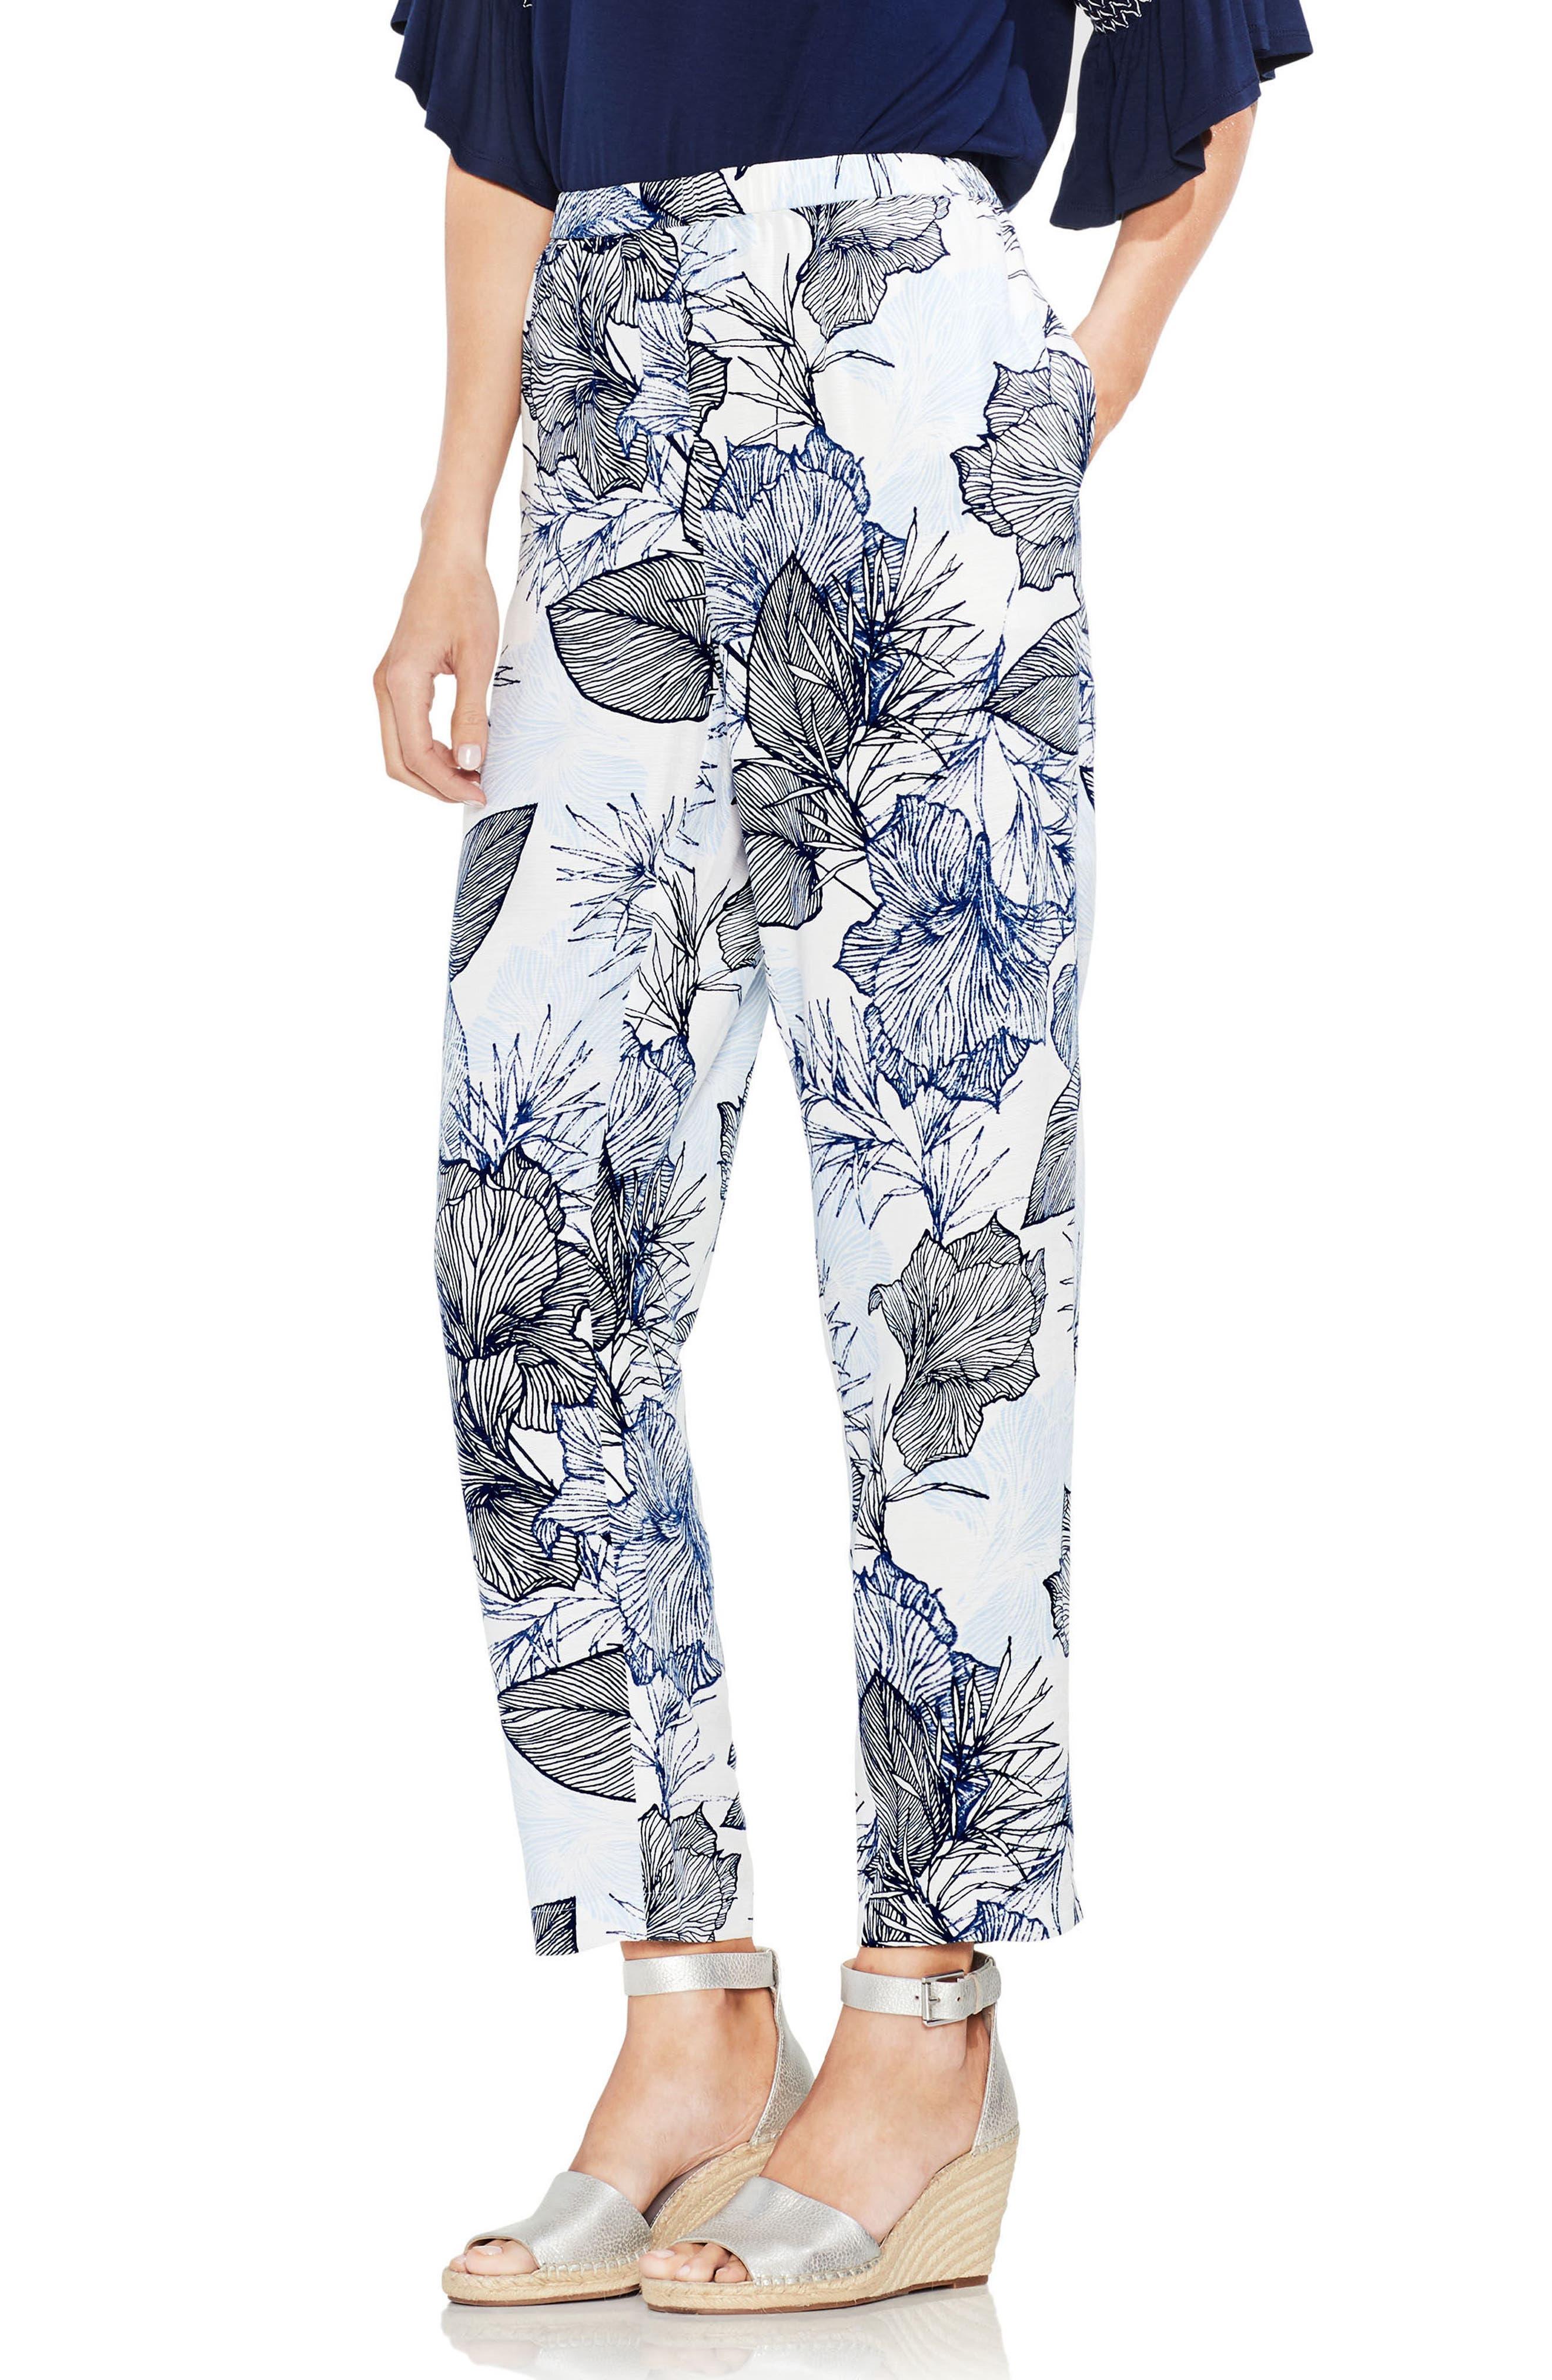 Etched Island Floral Slim Pants,                             Main thumbnail 1, color,